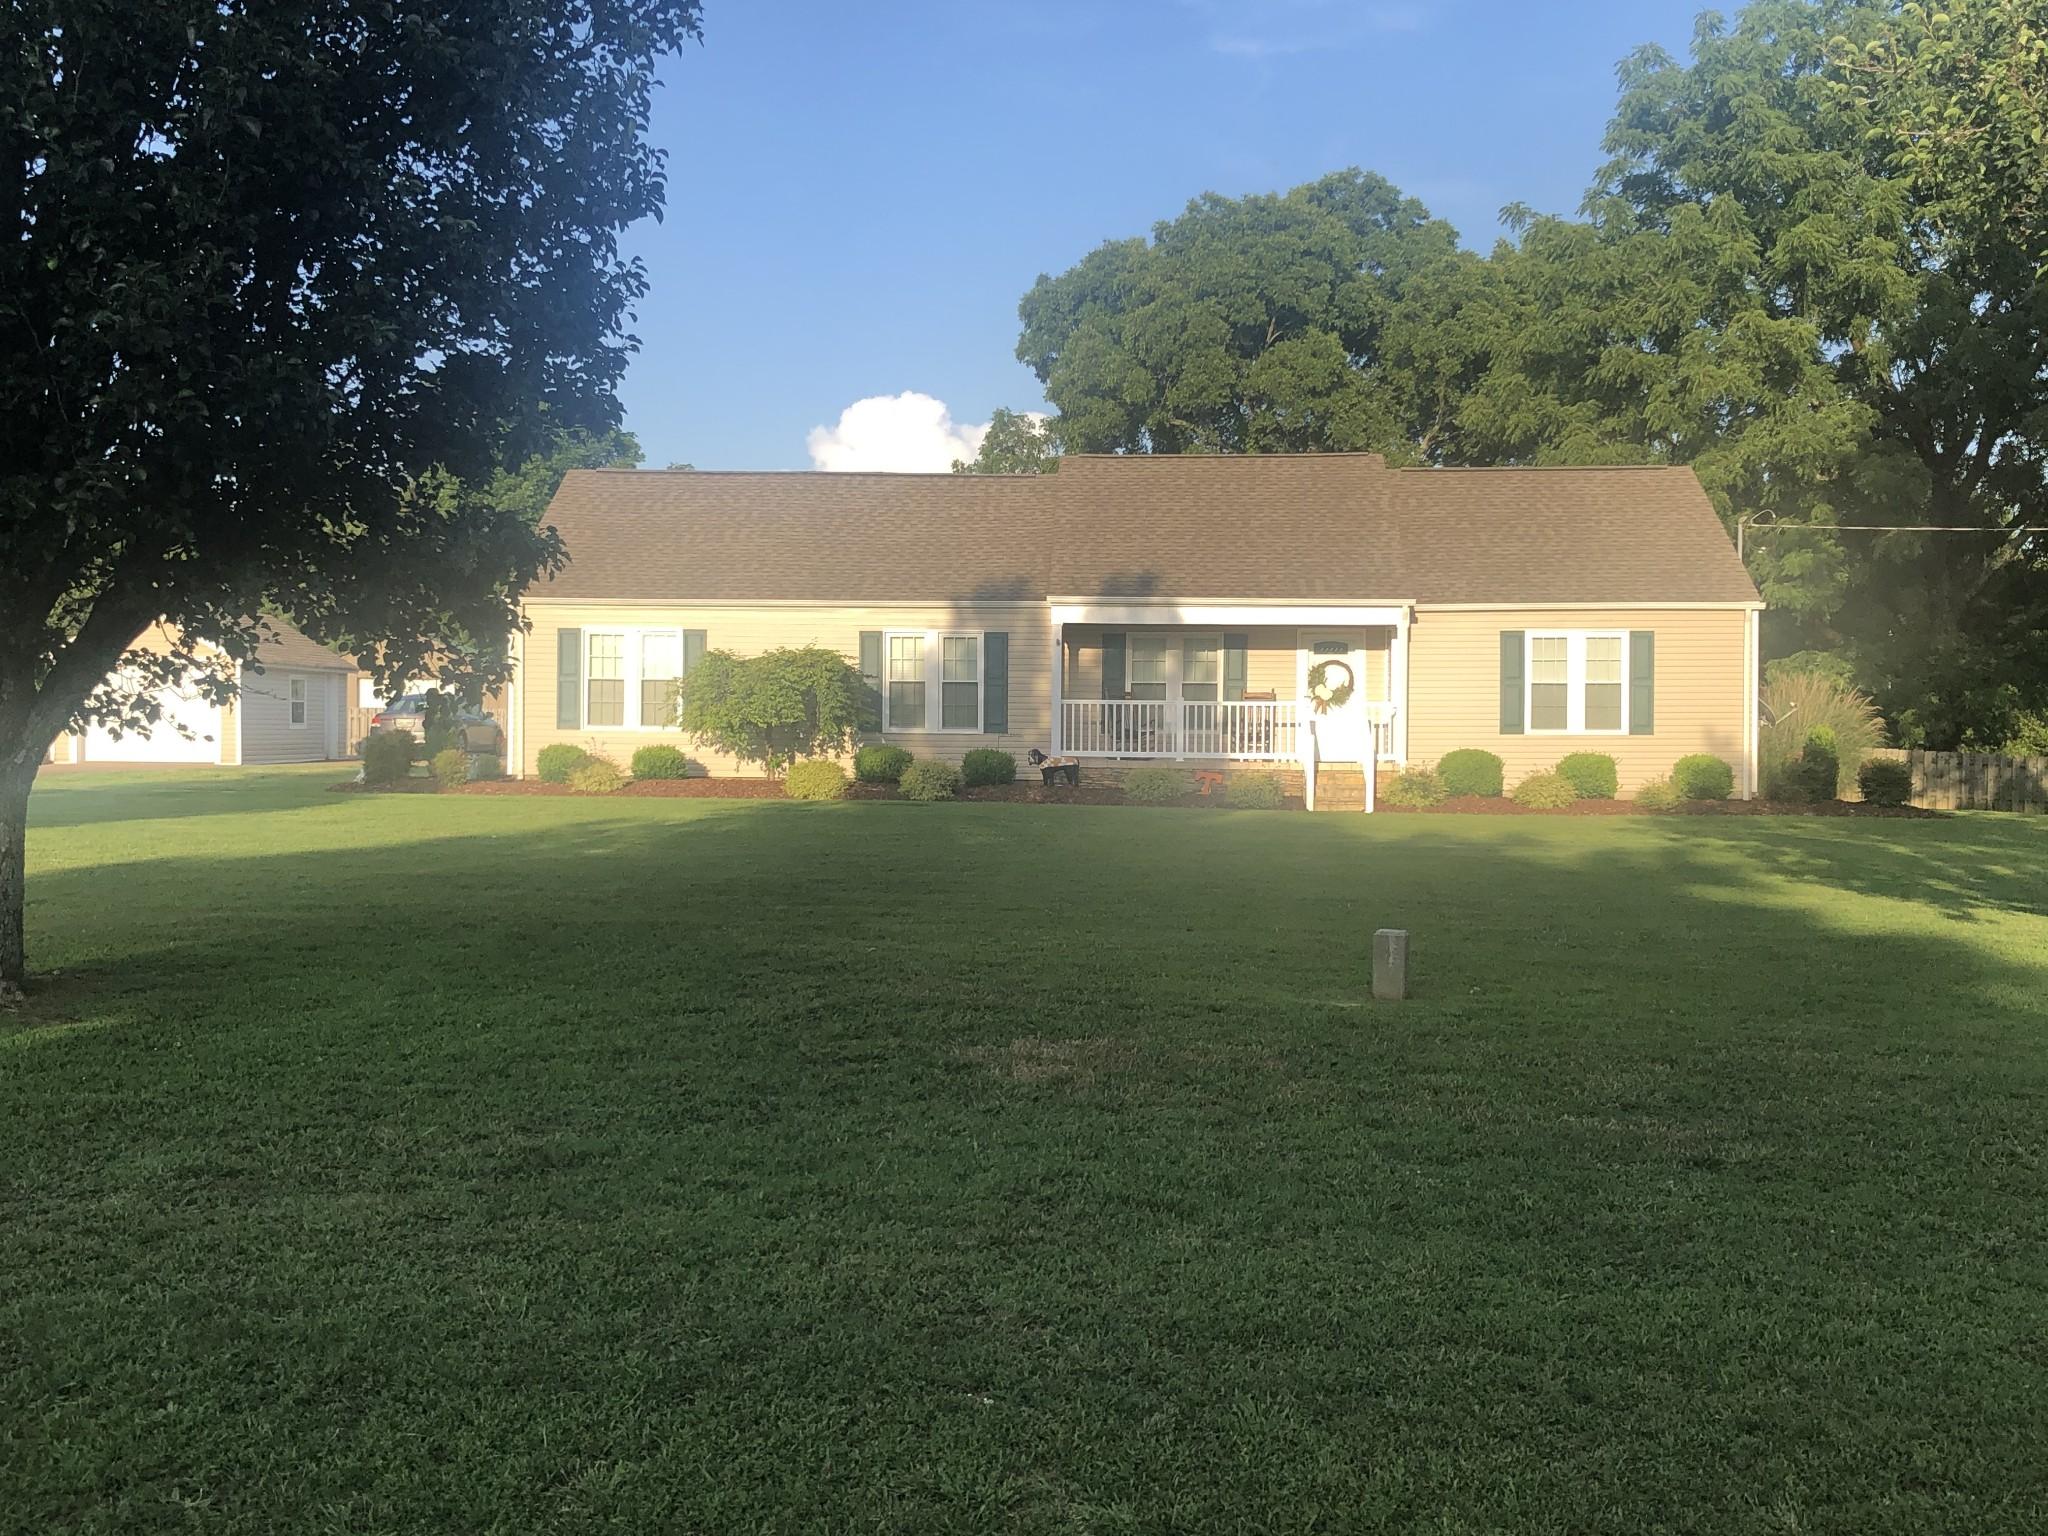 40 Shackelford Rd Property Photo - Loretto, TN real estate listing